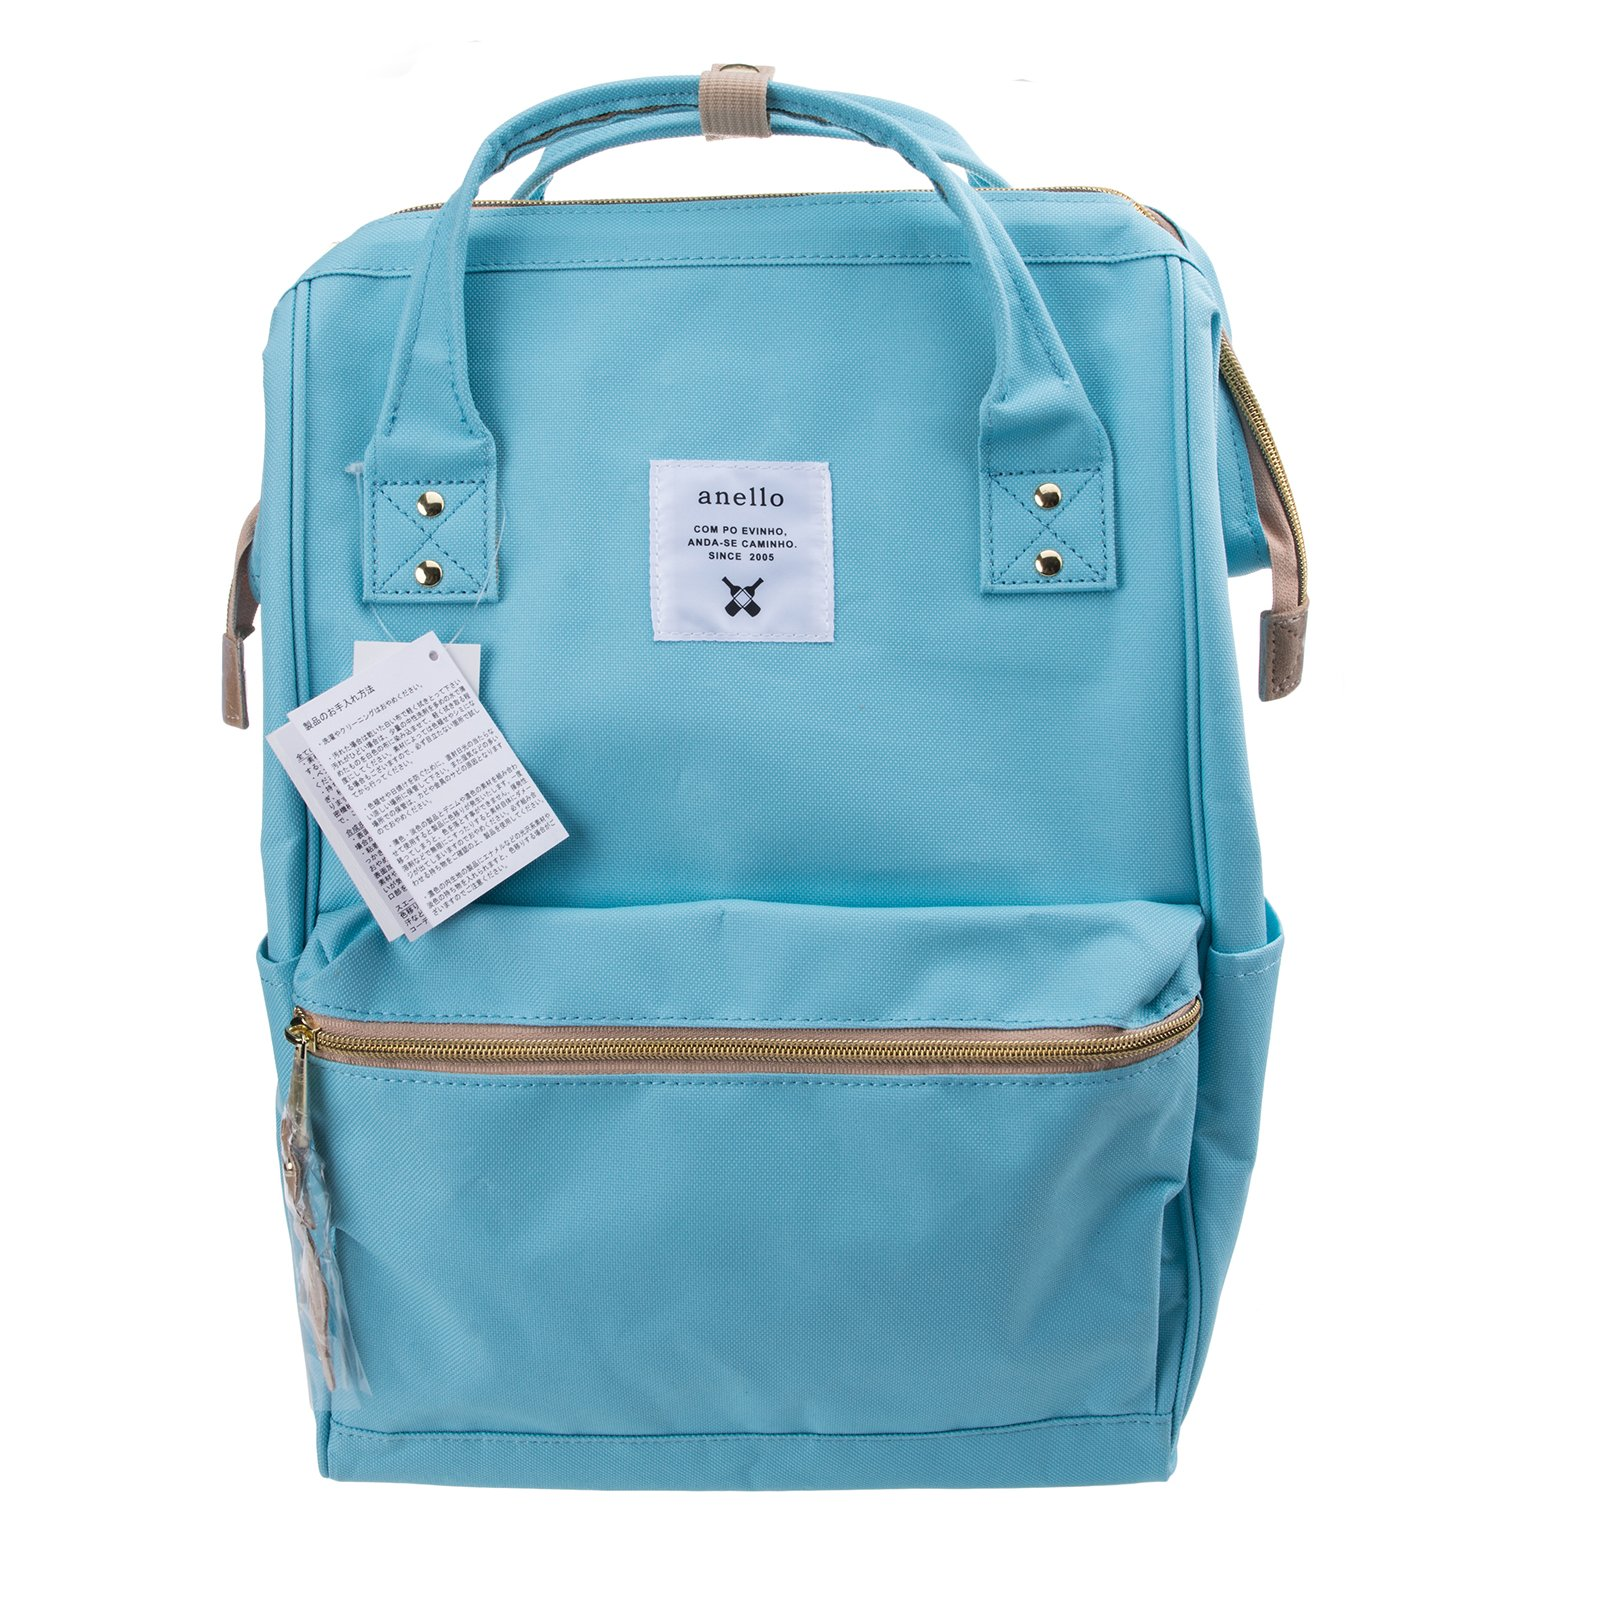 Anello Official Baby Blue Japan Fashion Shoulder Rucksack Backpack Hand Carry Tablet Diaper Bag Unisex